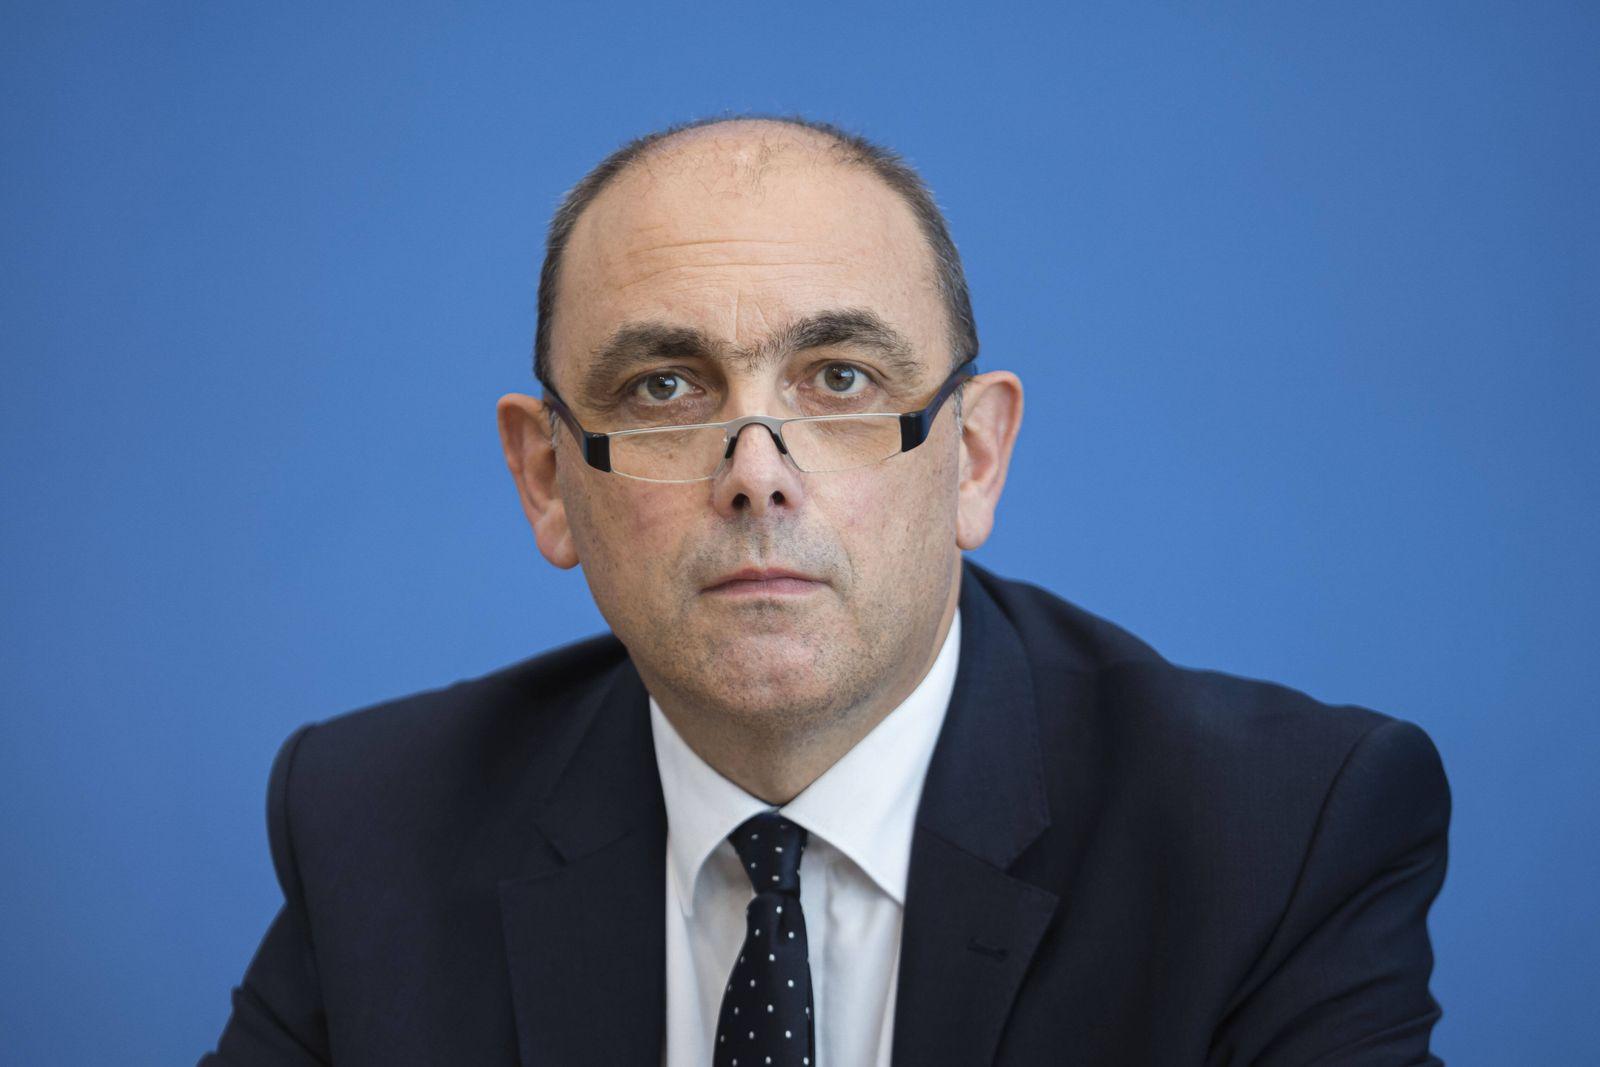 Lars Schaade, Vizepraesident des Robert-Koch-Institut ( RKI ). Berlin, 03.11.2020 Berlin Deutschland *** Lars Schaade, V